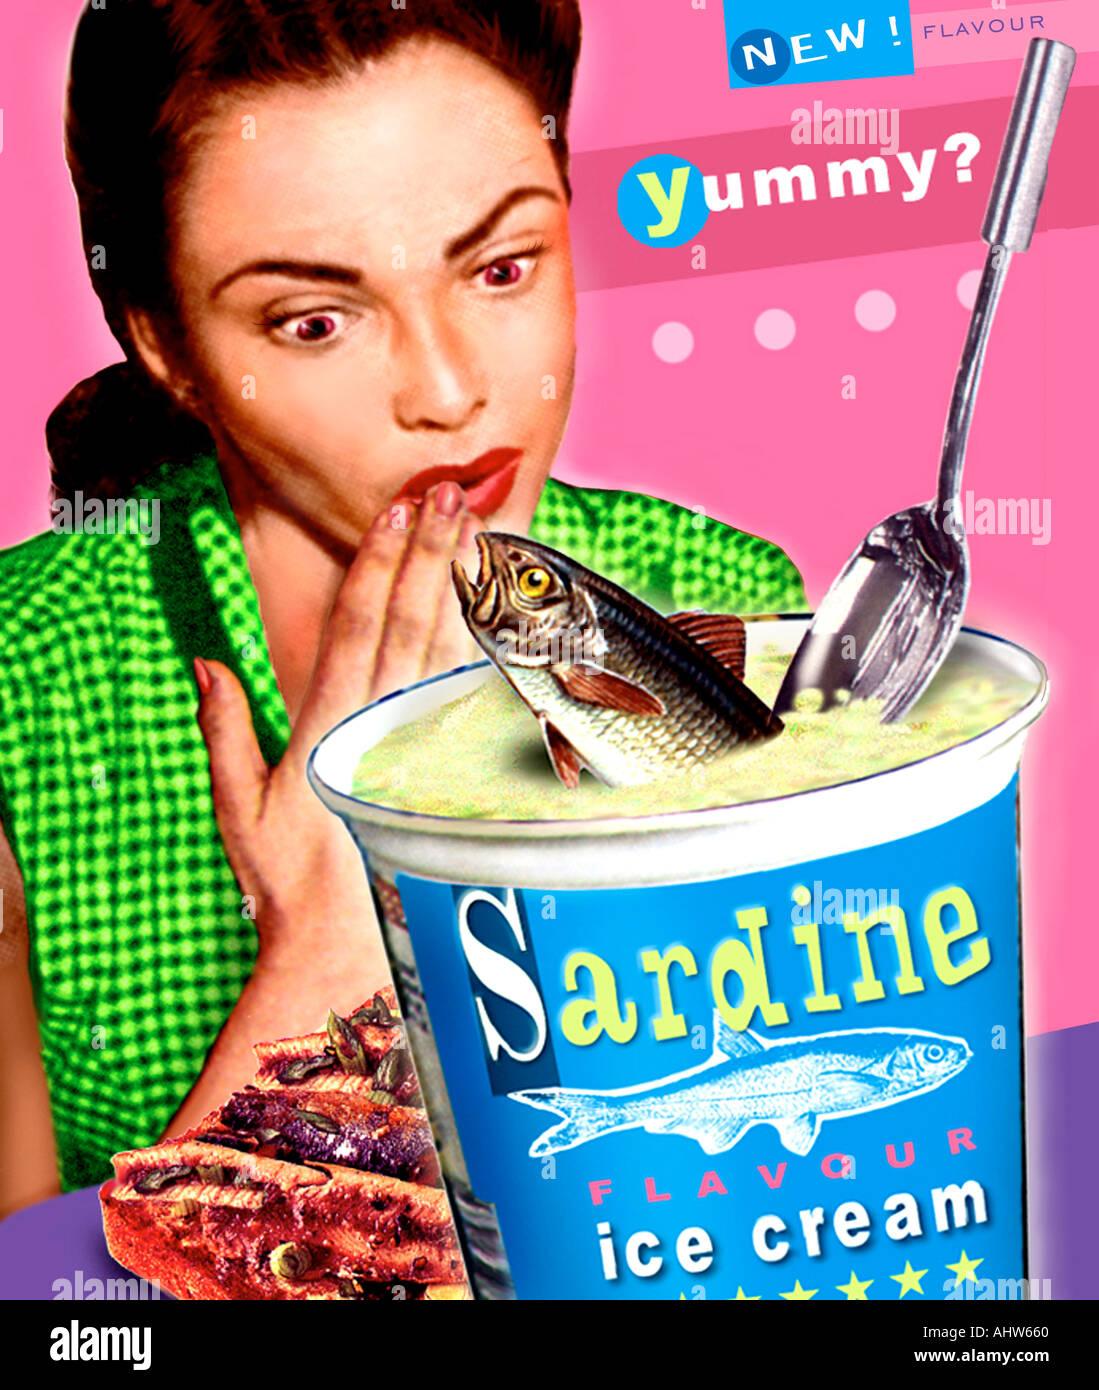 sardine ice cream - Stock Image